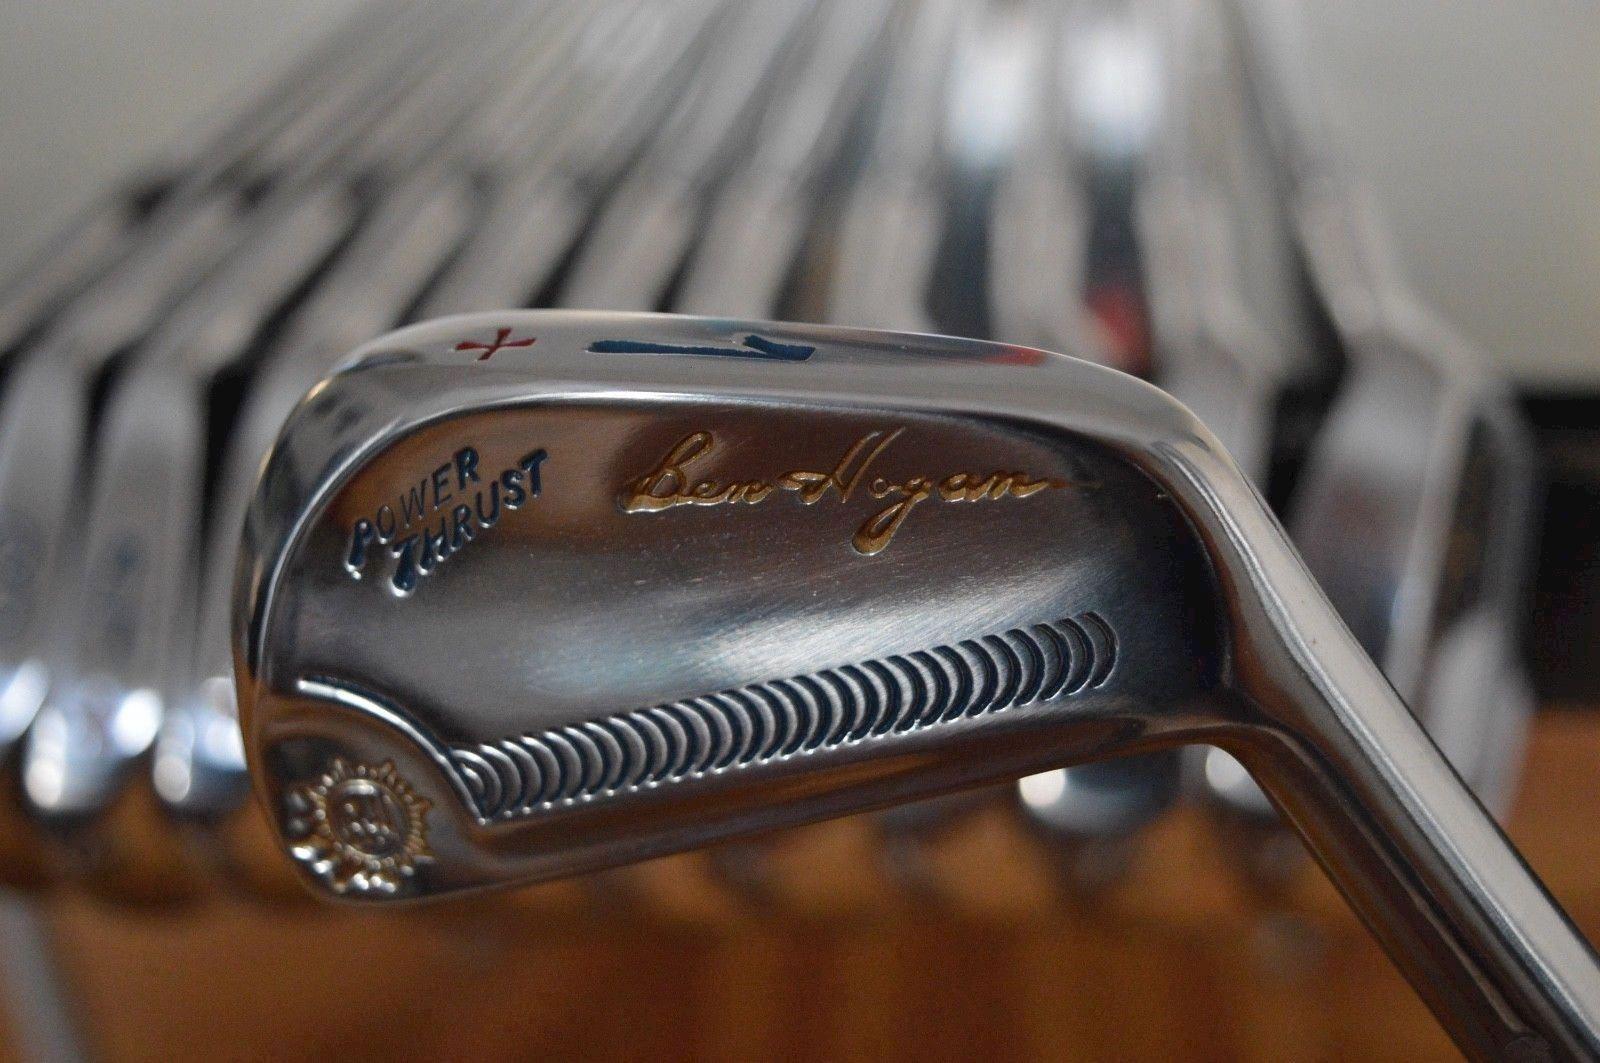 Ben Hogan Vintage 1962 PowerThrust golf iron set 1/E 42' & 45 ...